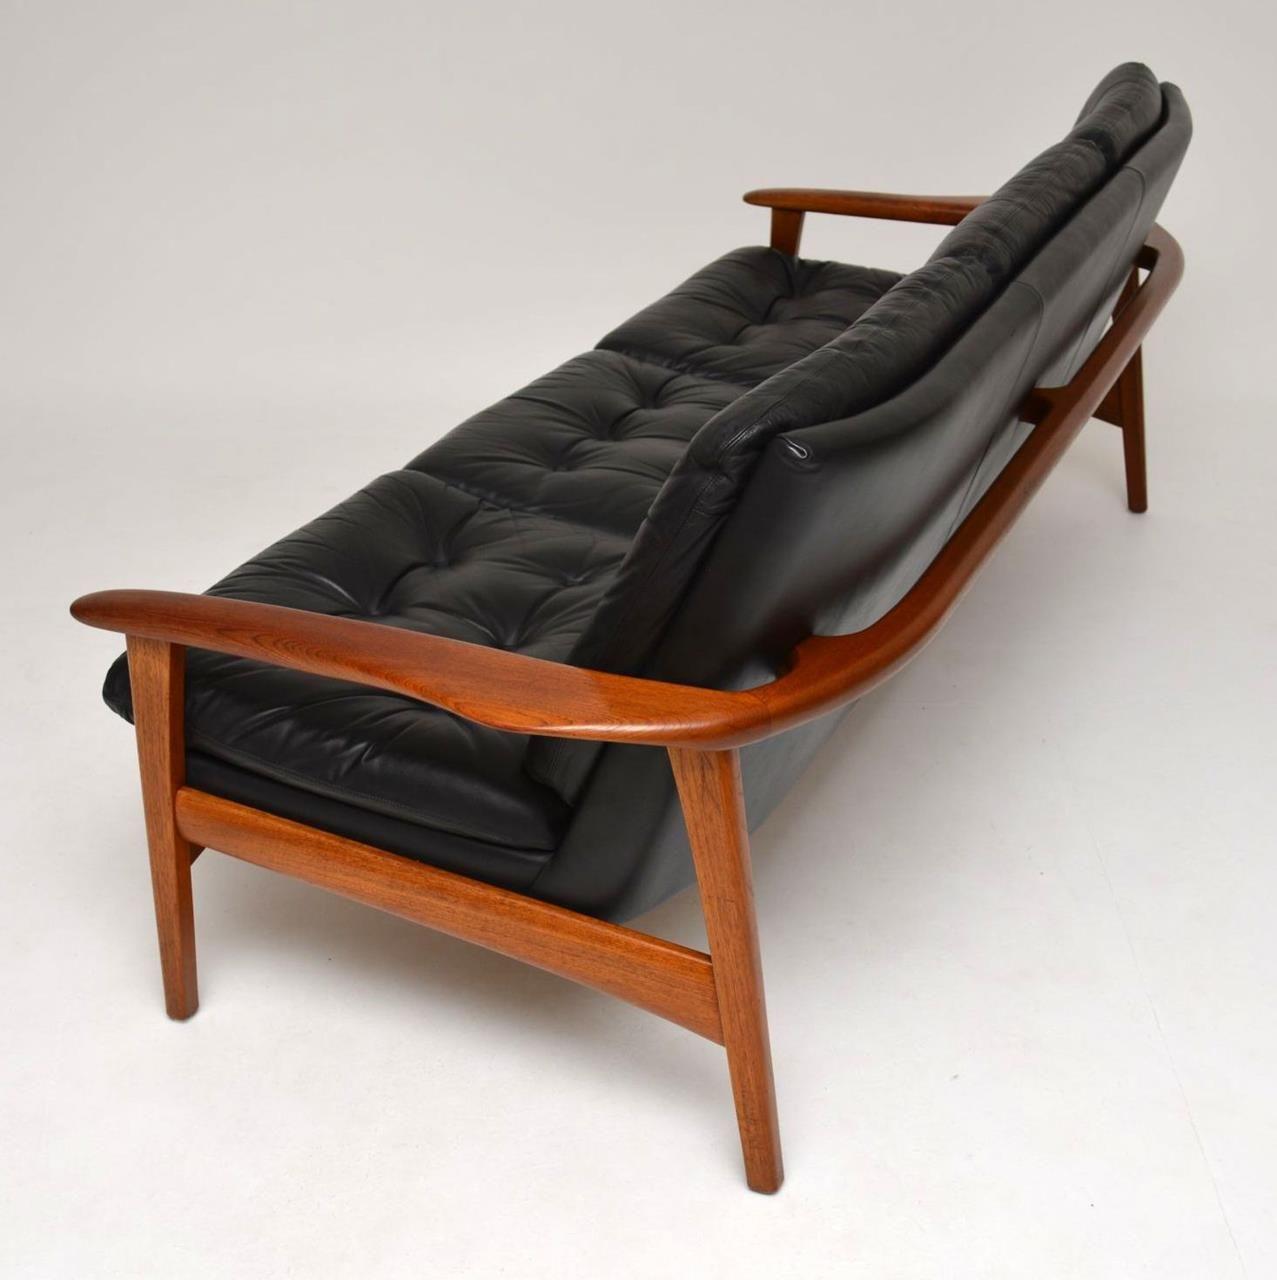 Danish Teak Retro Leather Sofa Vintage 1960s Vintage Sofa Retro Sofa Leather Sectional Sofas